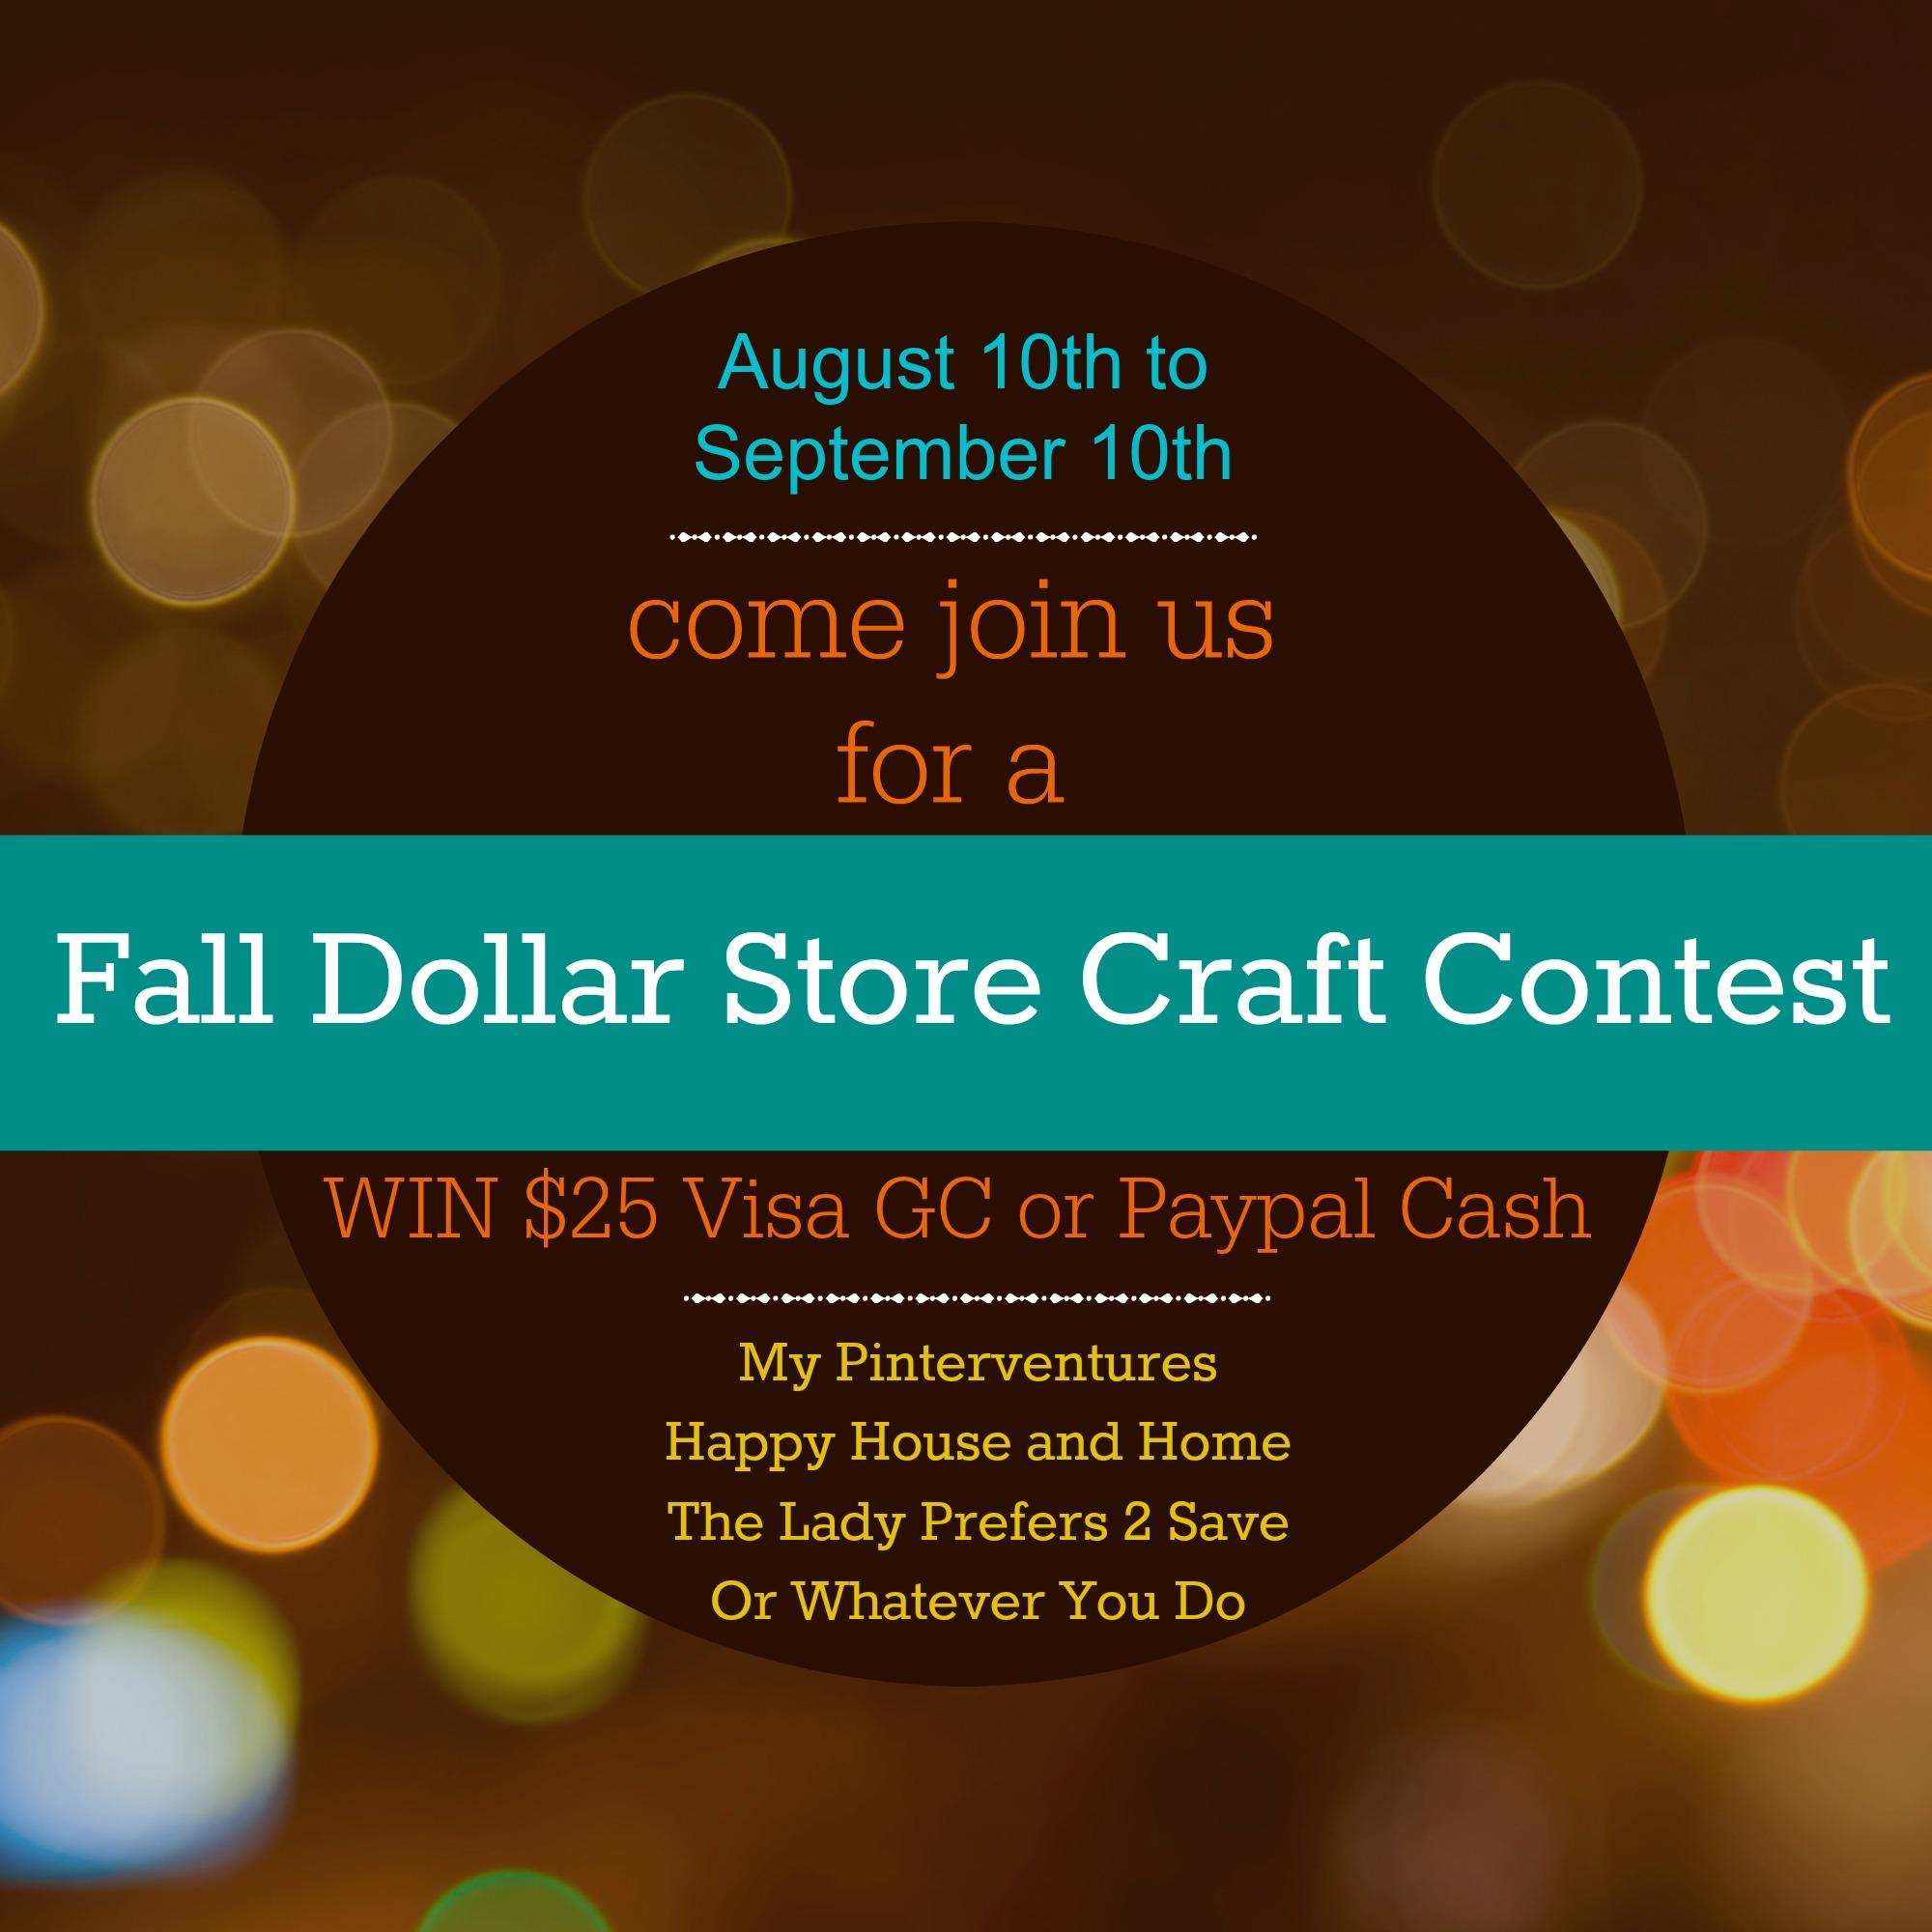 Fall Dollar Store Craft Contest